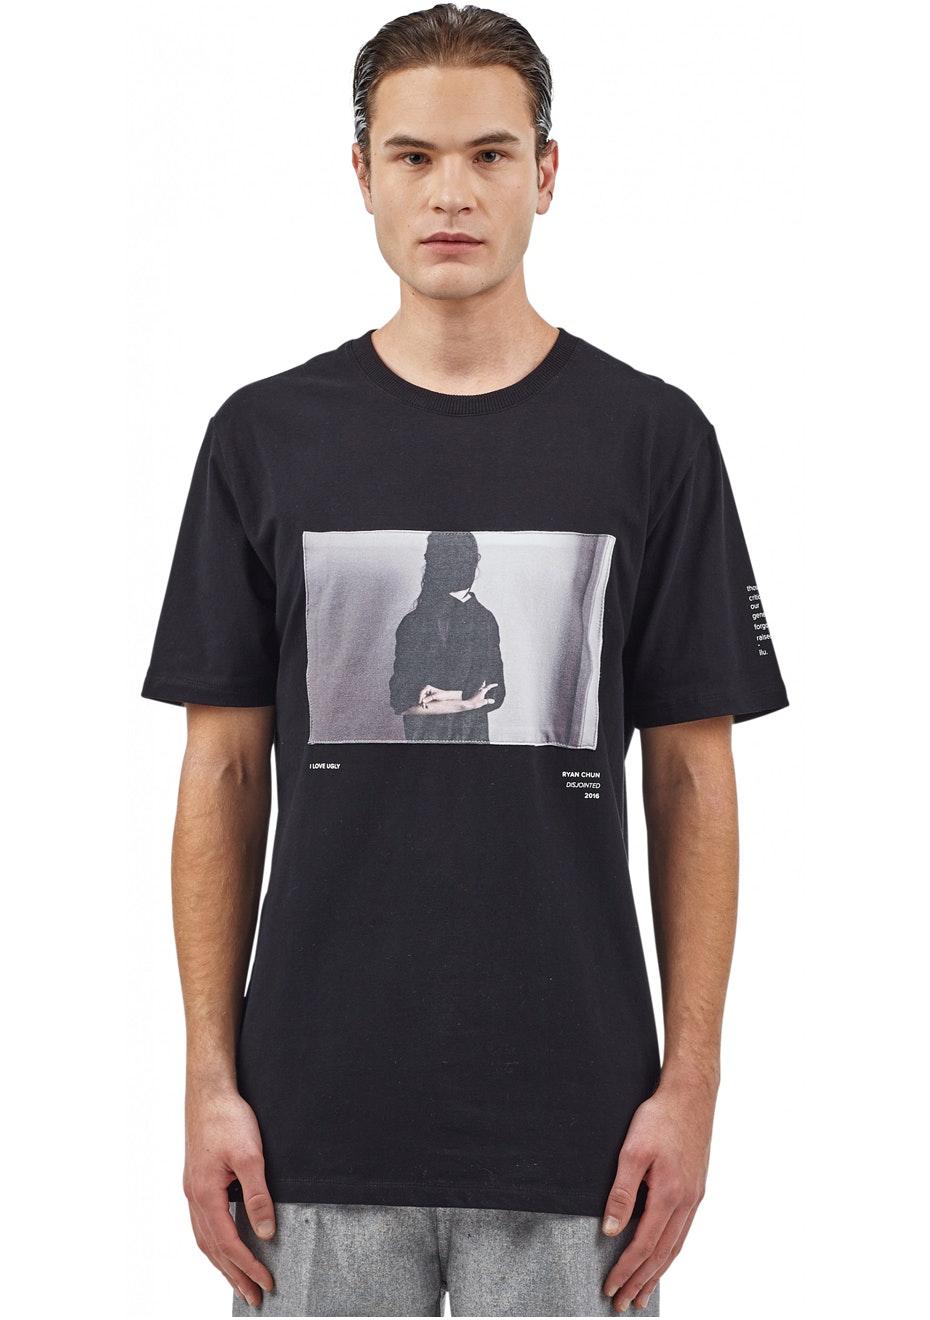 I Love Ugly - Rc Backwards Tshirt - Black